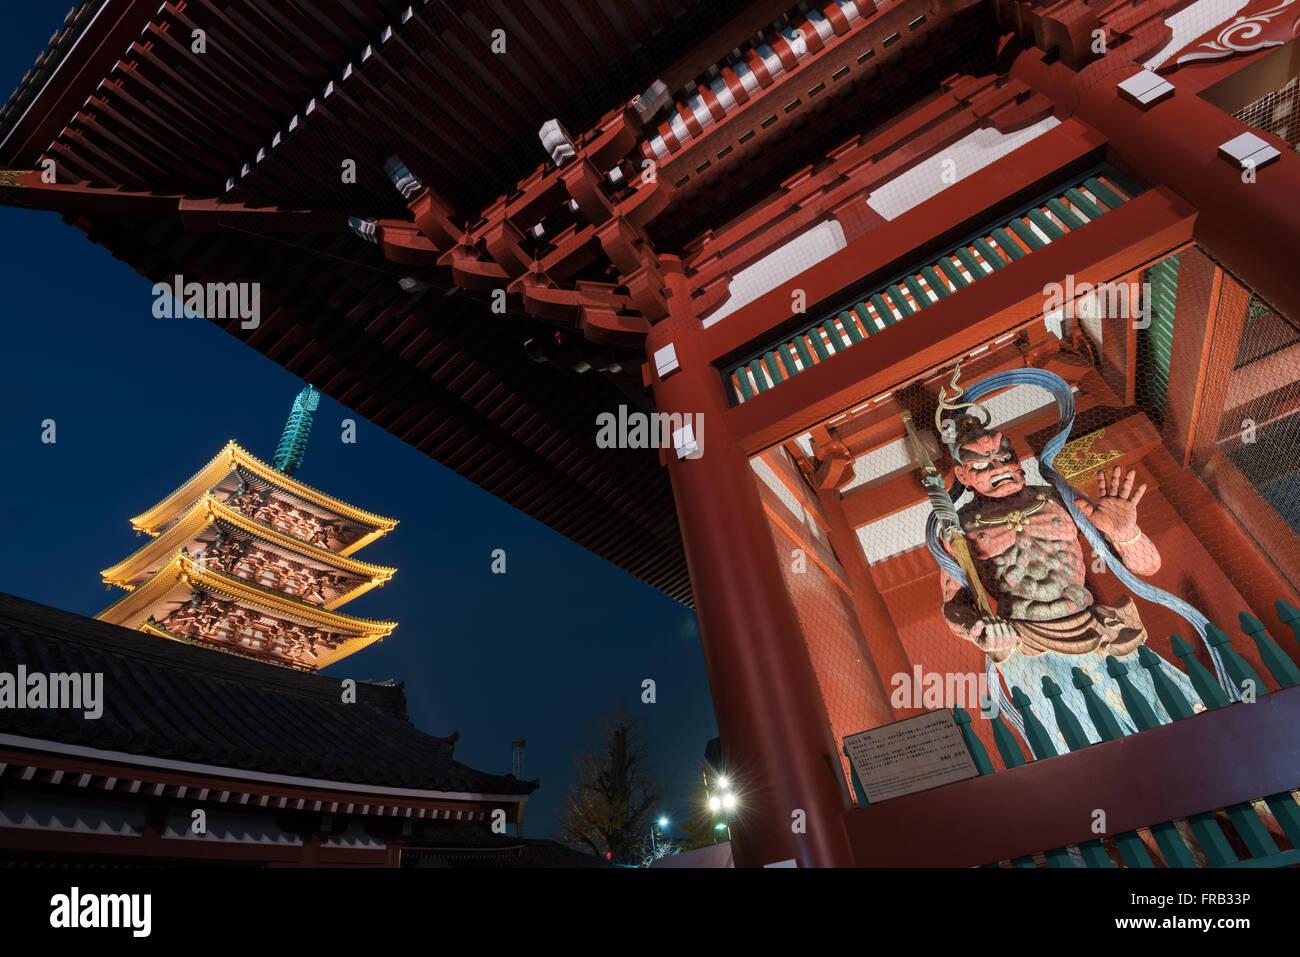 Tokyo, Japan - 16. Dezember 2015: Die fünfgeschossige Pagode der Senso-Ji Tempel in Asakusa, Tokio. Stockbild